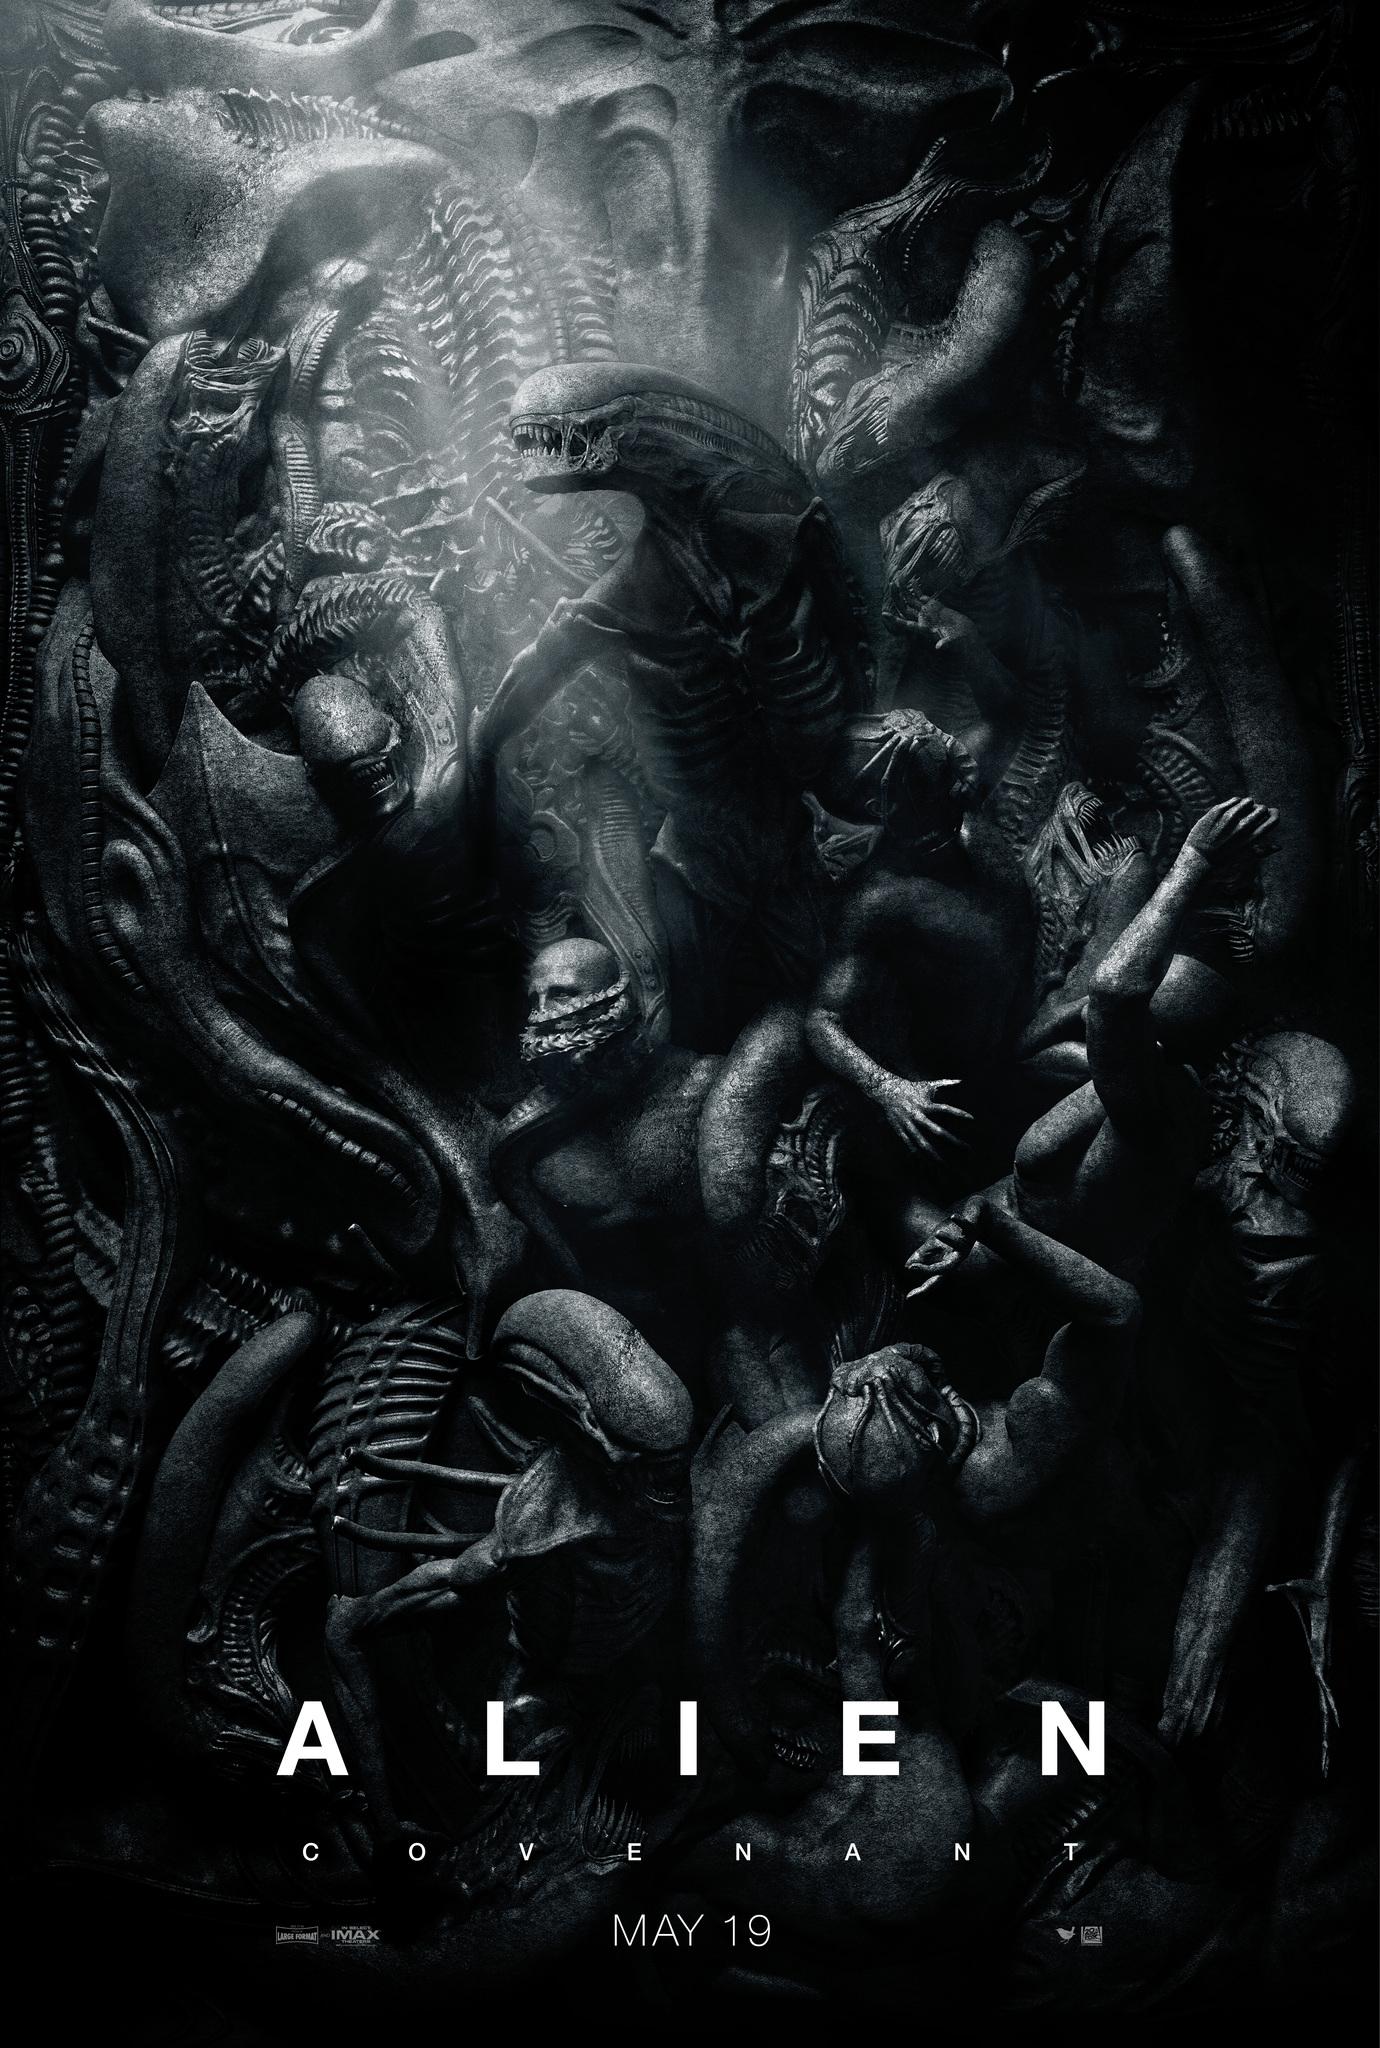 مشاهدة فيلم Alien Covenant 2017 مترجم اون لاين